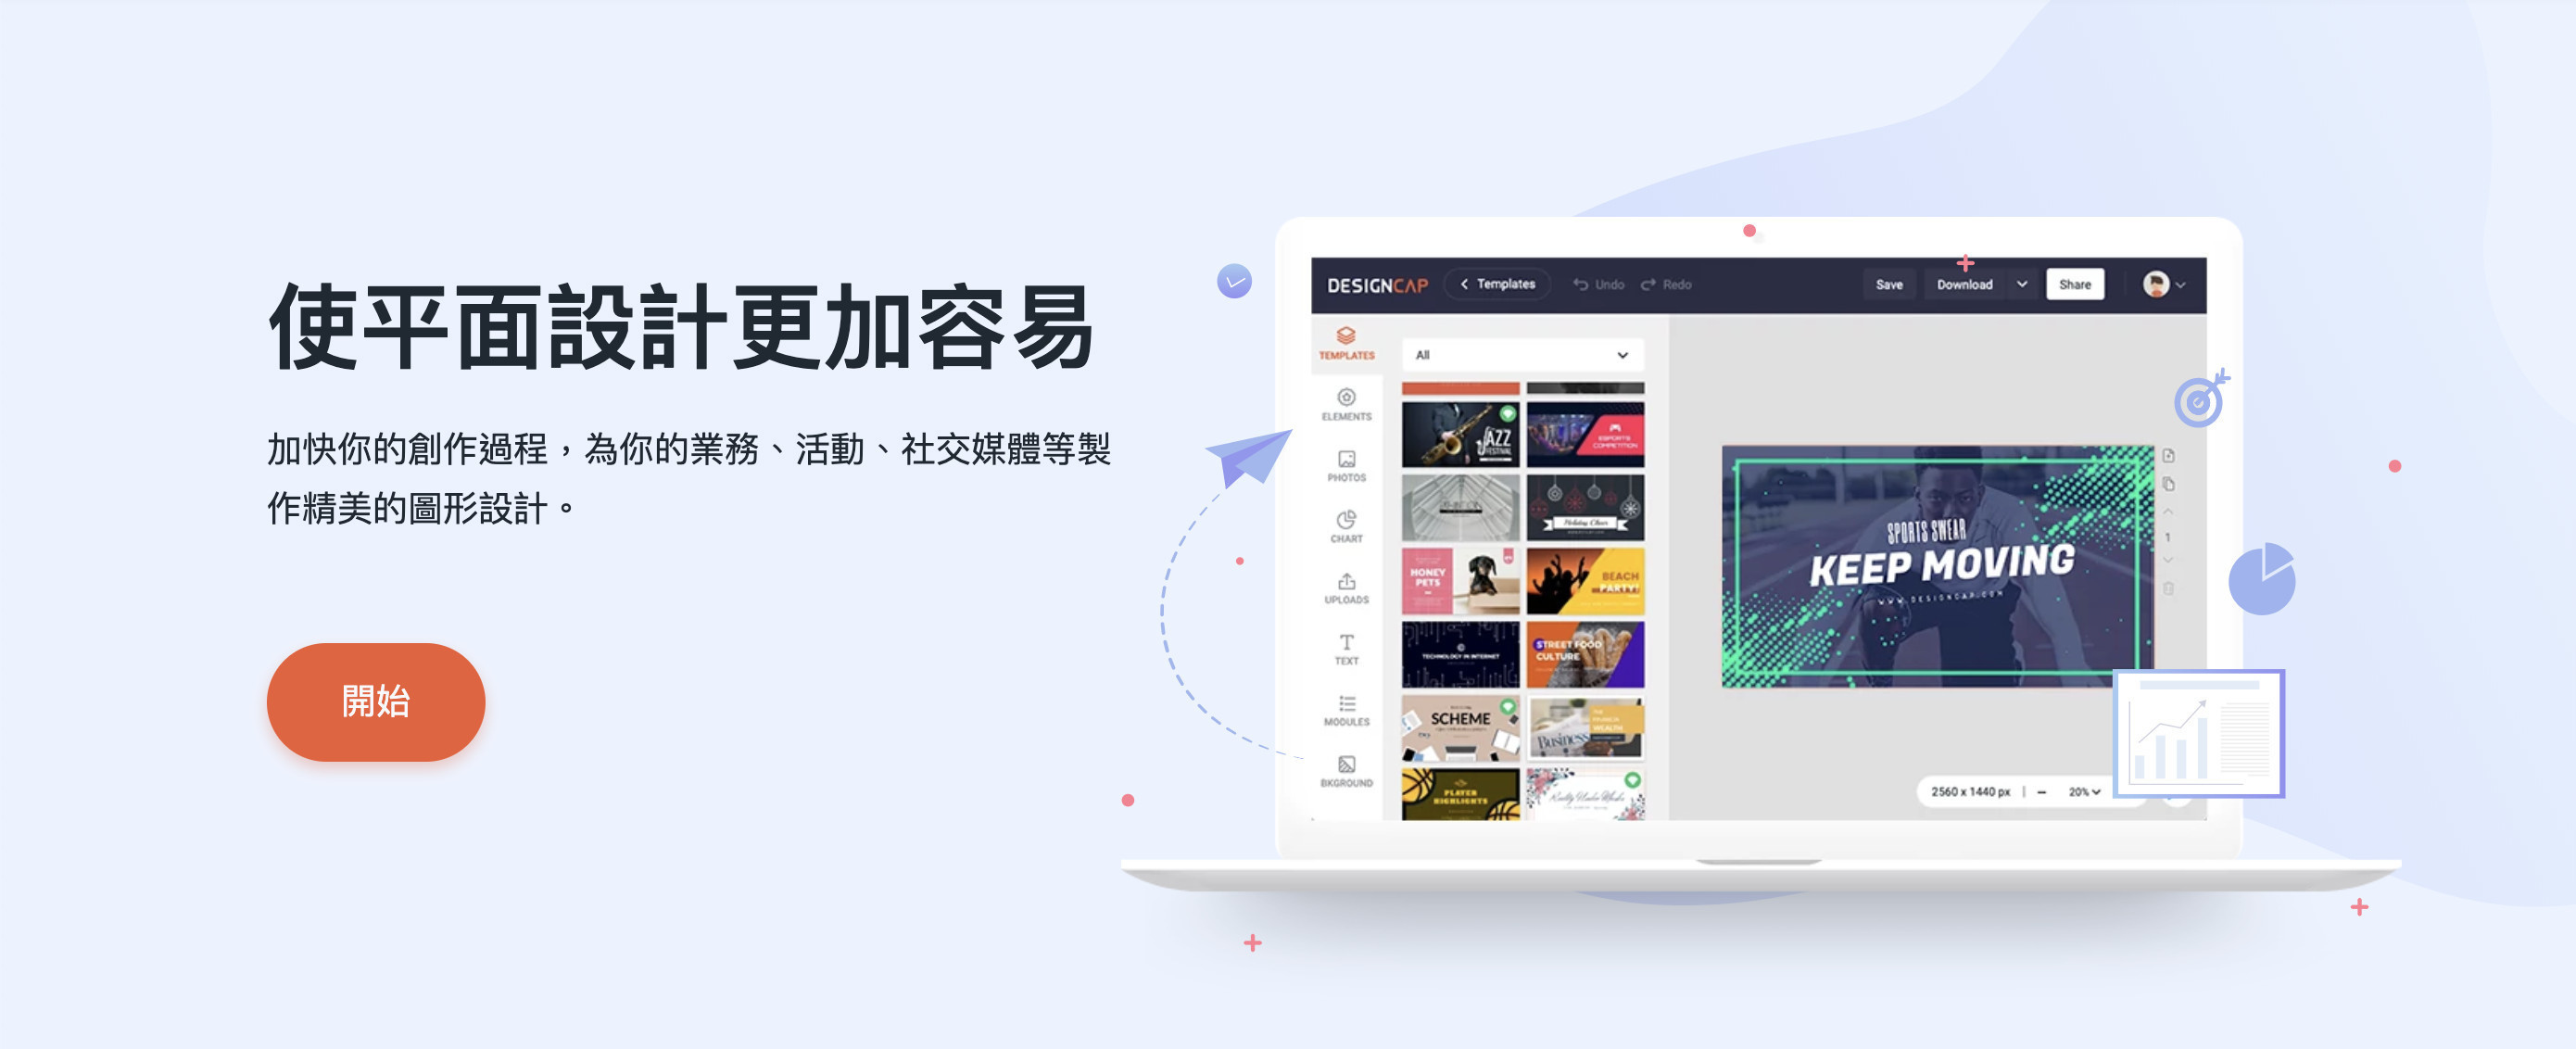 Design Cap免費線上平面設計公司-鯊客科技SEO優化網頁設計公司